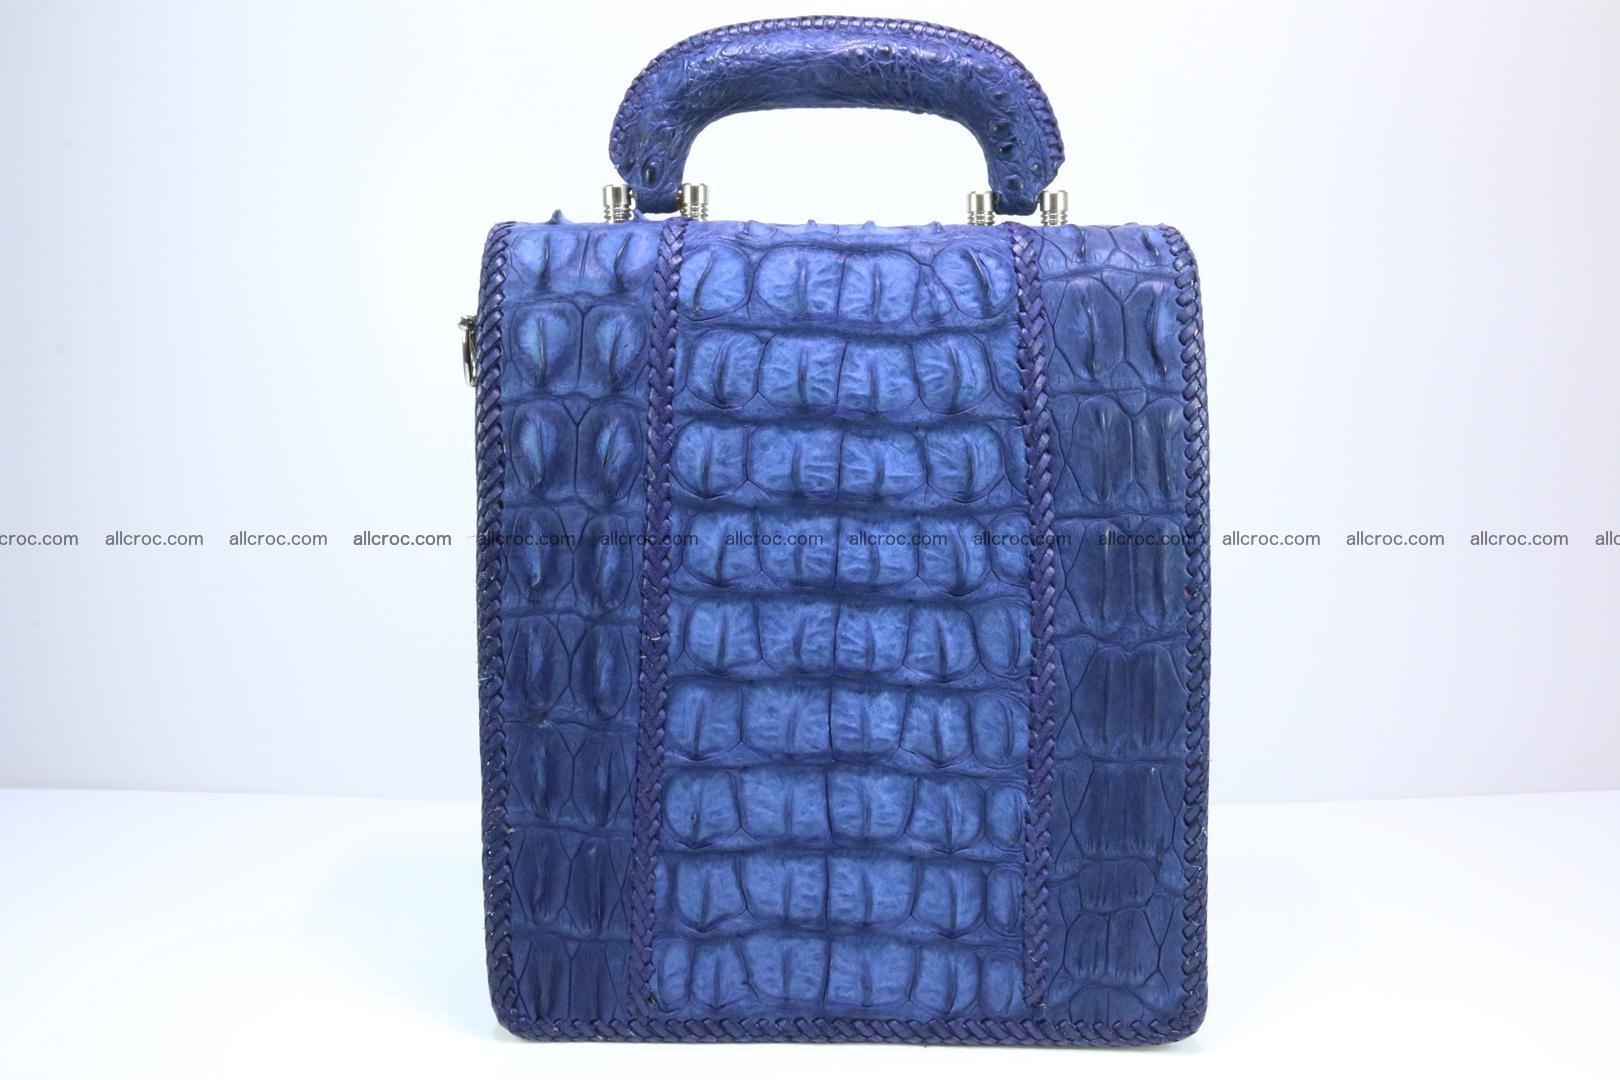 Crocodile skin messenger bag braided edges 422 Foto 1